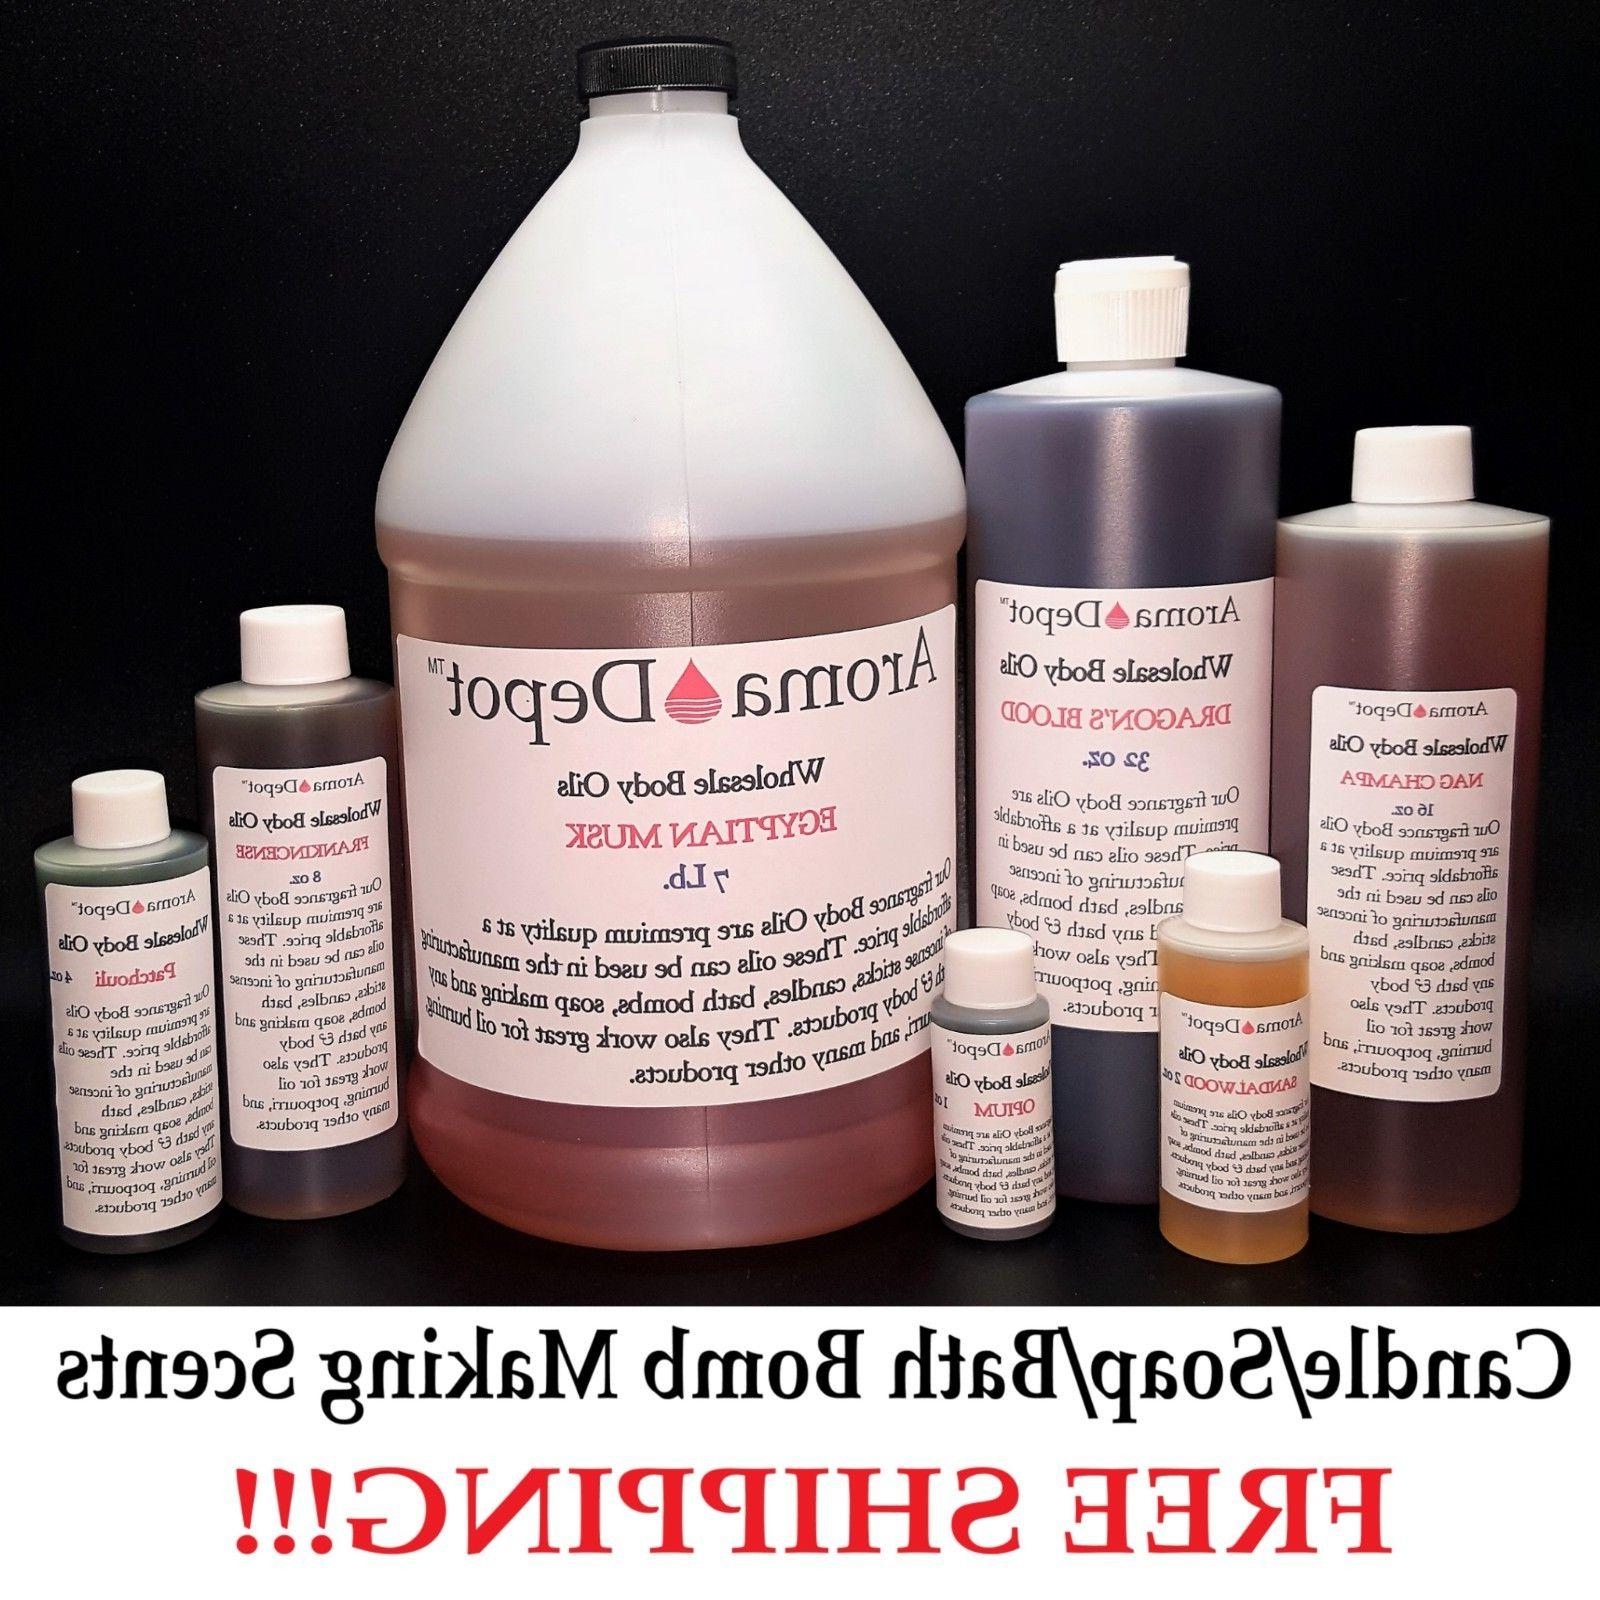 4 oz Scented Fragrance Oil Bomb Free